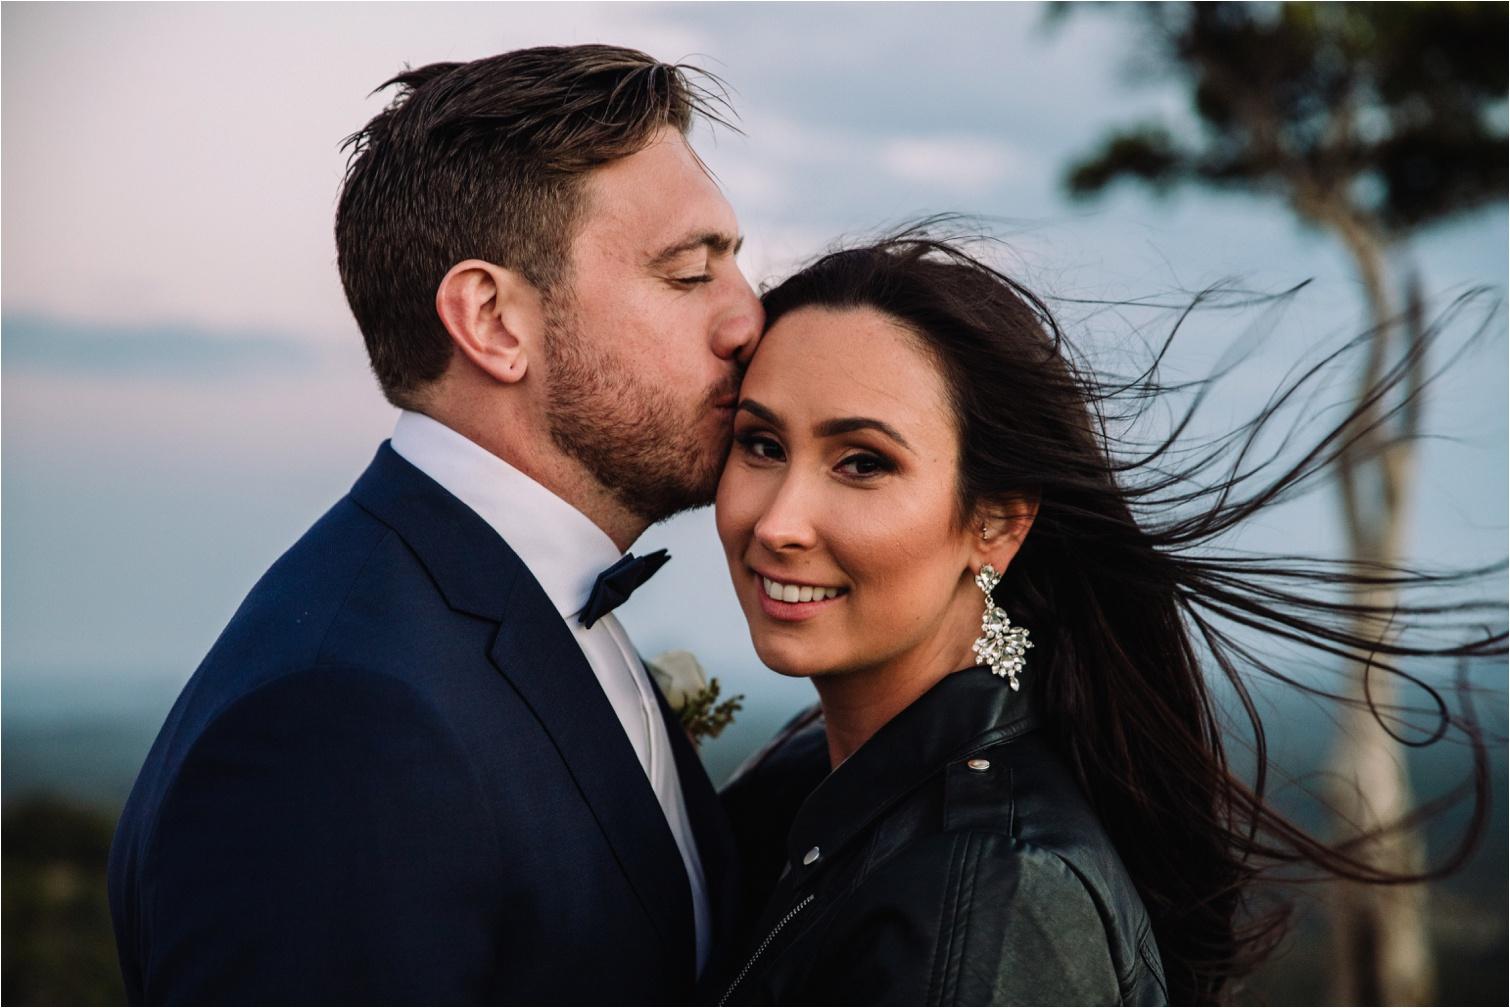 Maleny Manor Wedding Photography - Gold Coast Wedding Photographer_0059.jpg